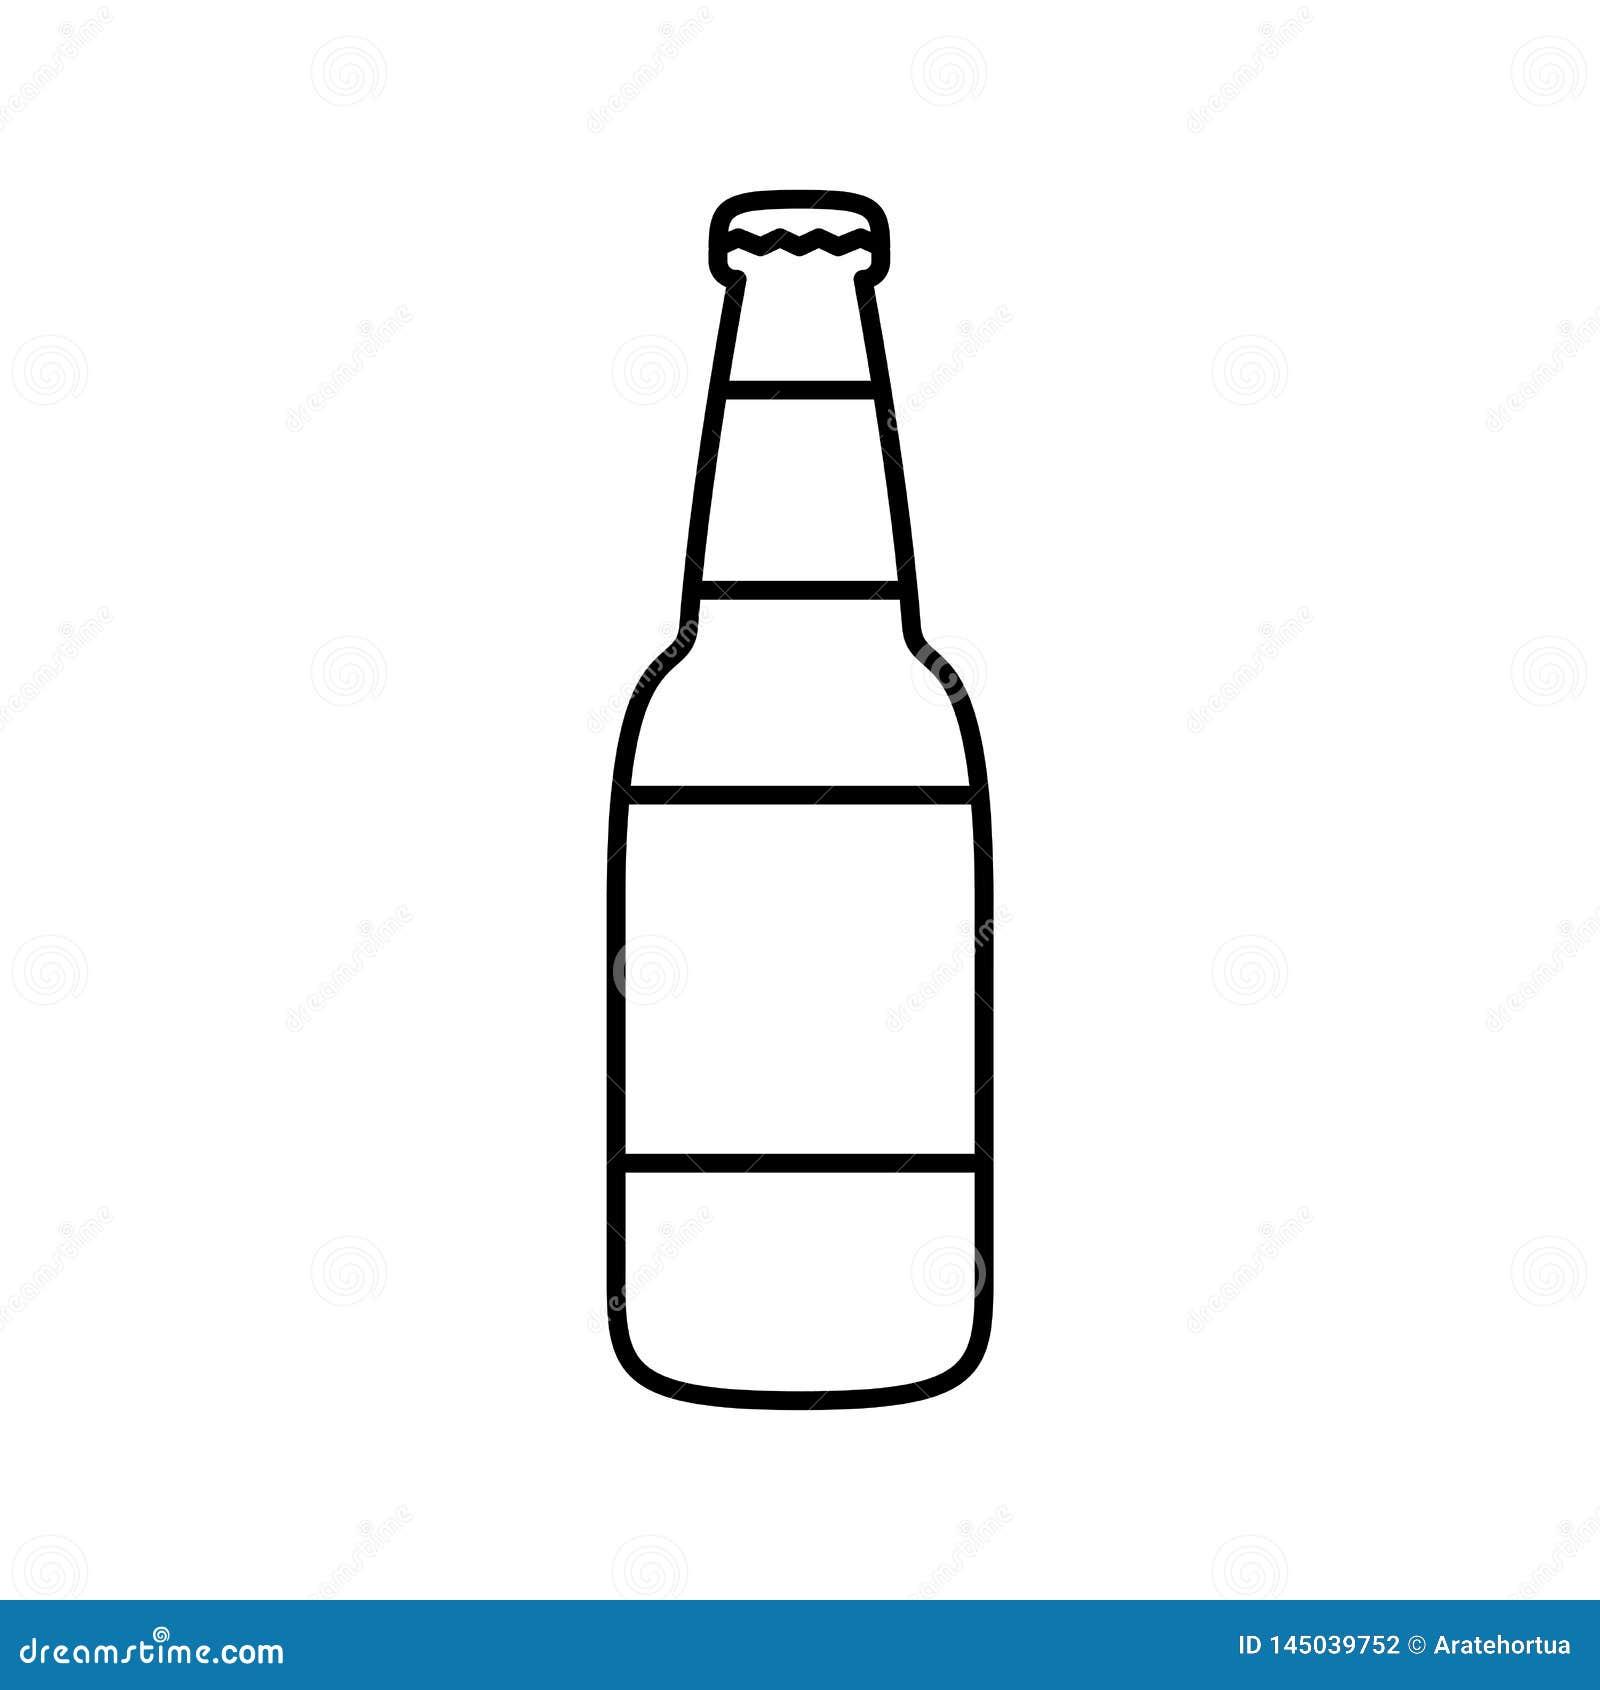 Cartoon Beer Bottle Icon Isolated On White Background